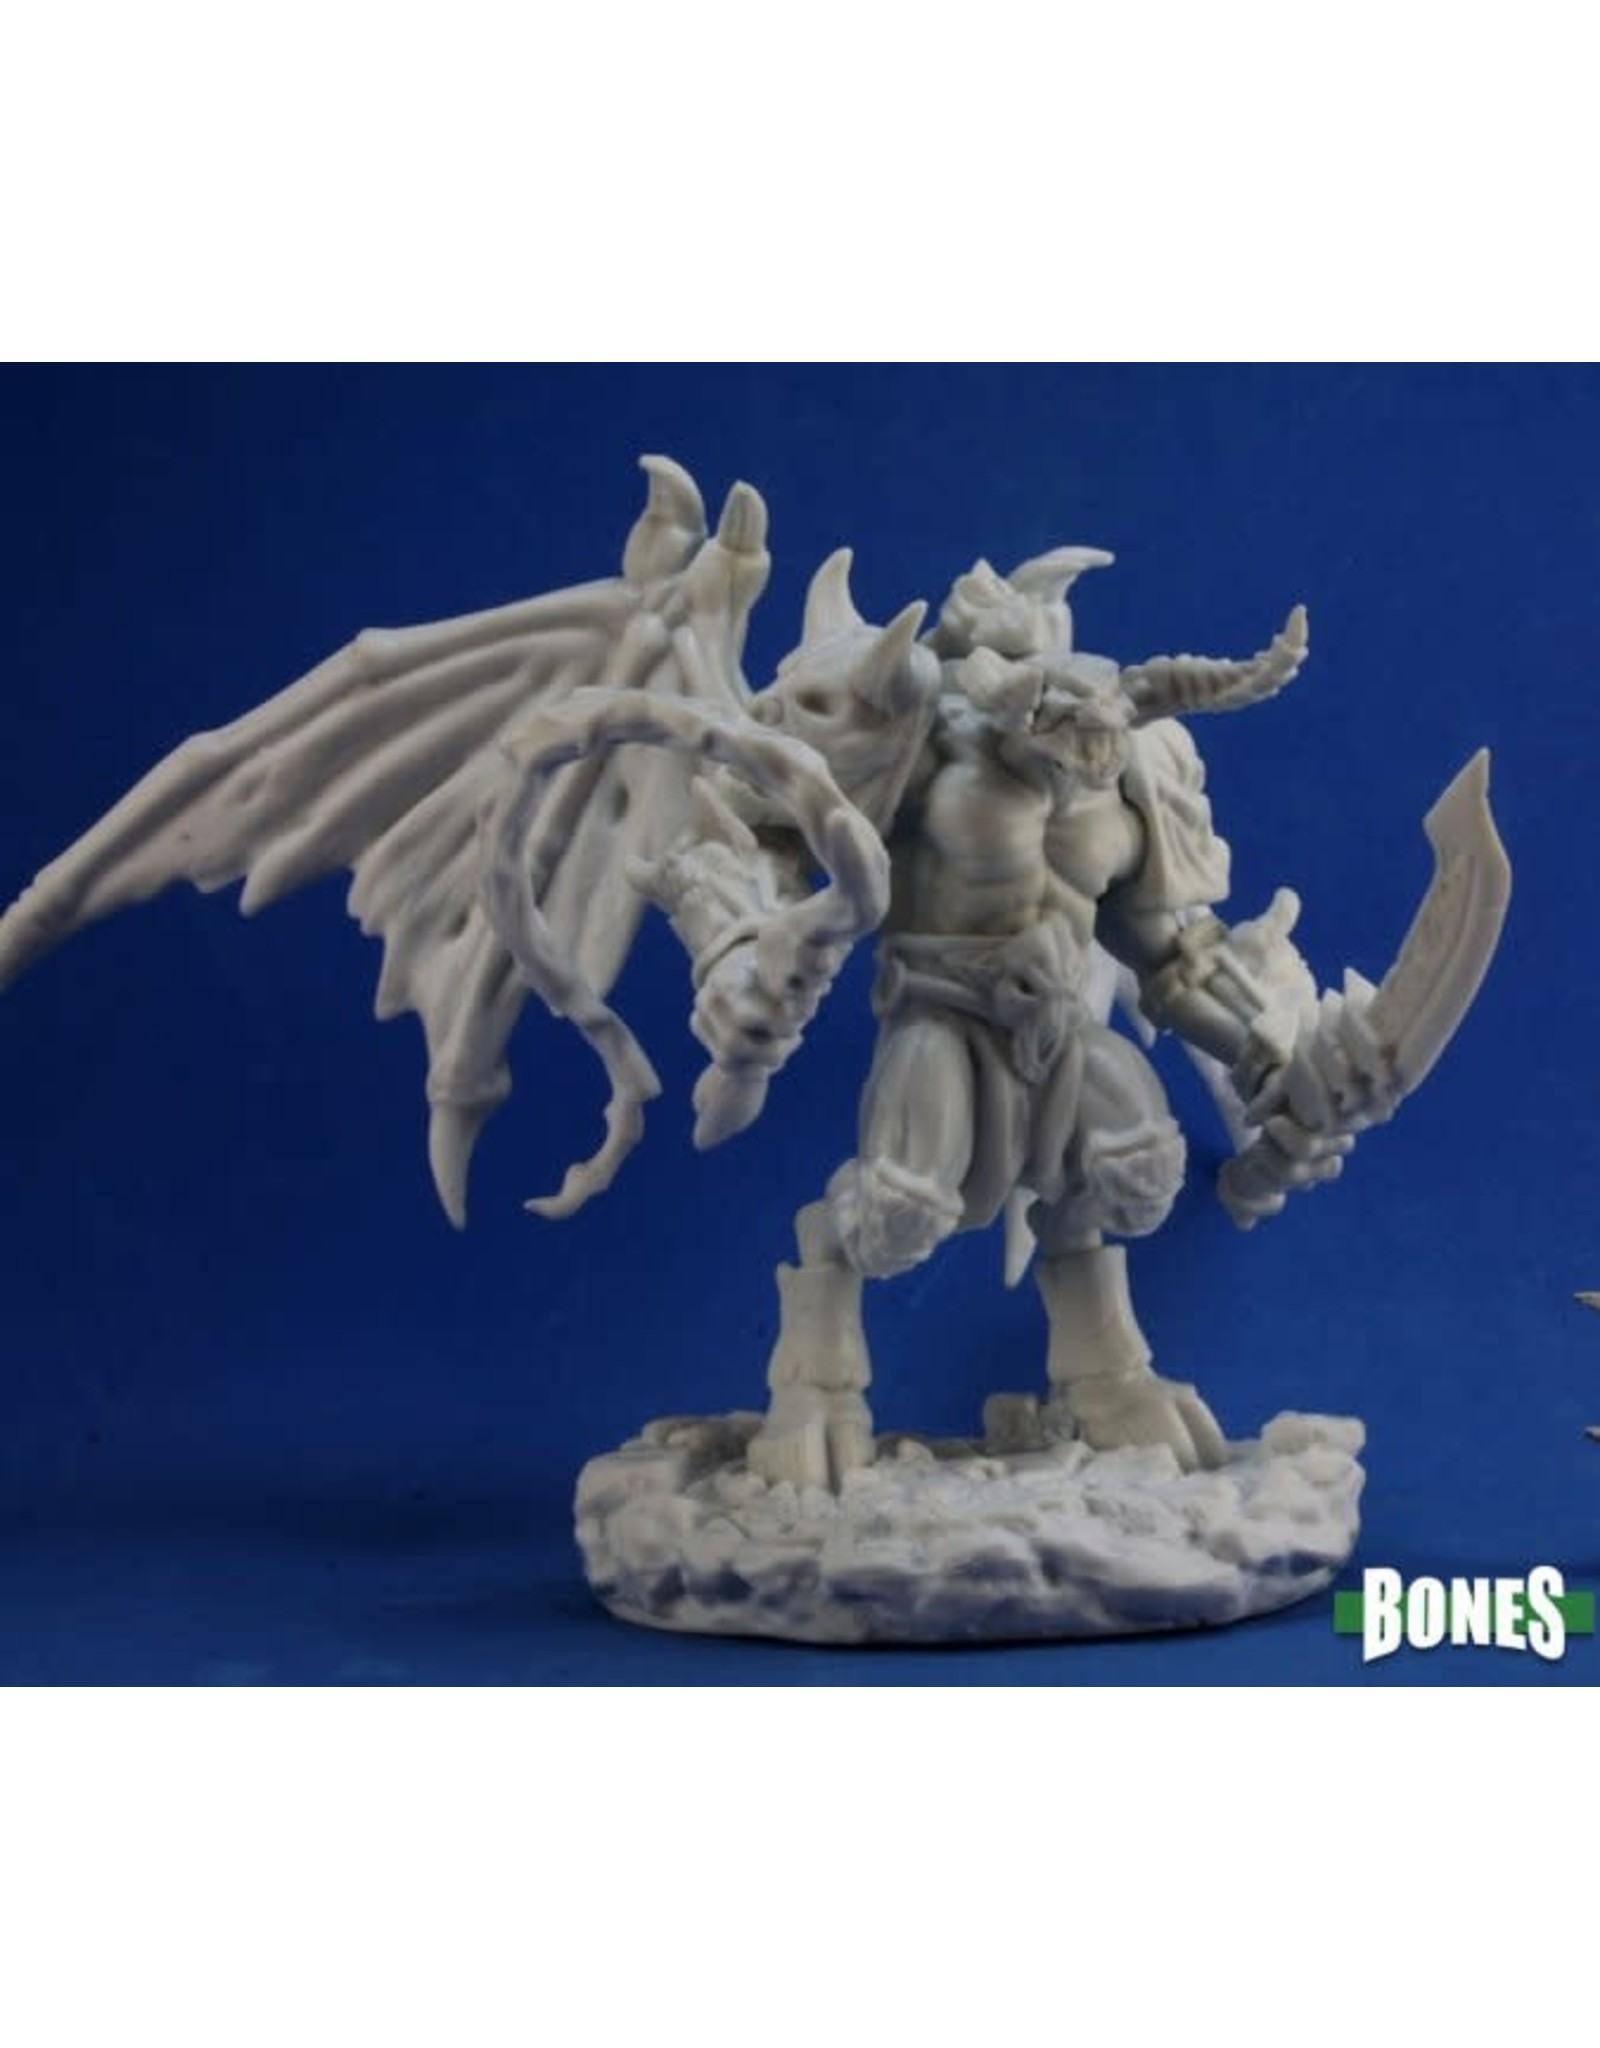 Reaper Miniatures Bones: Fire Demon Balor